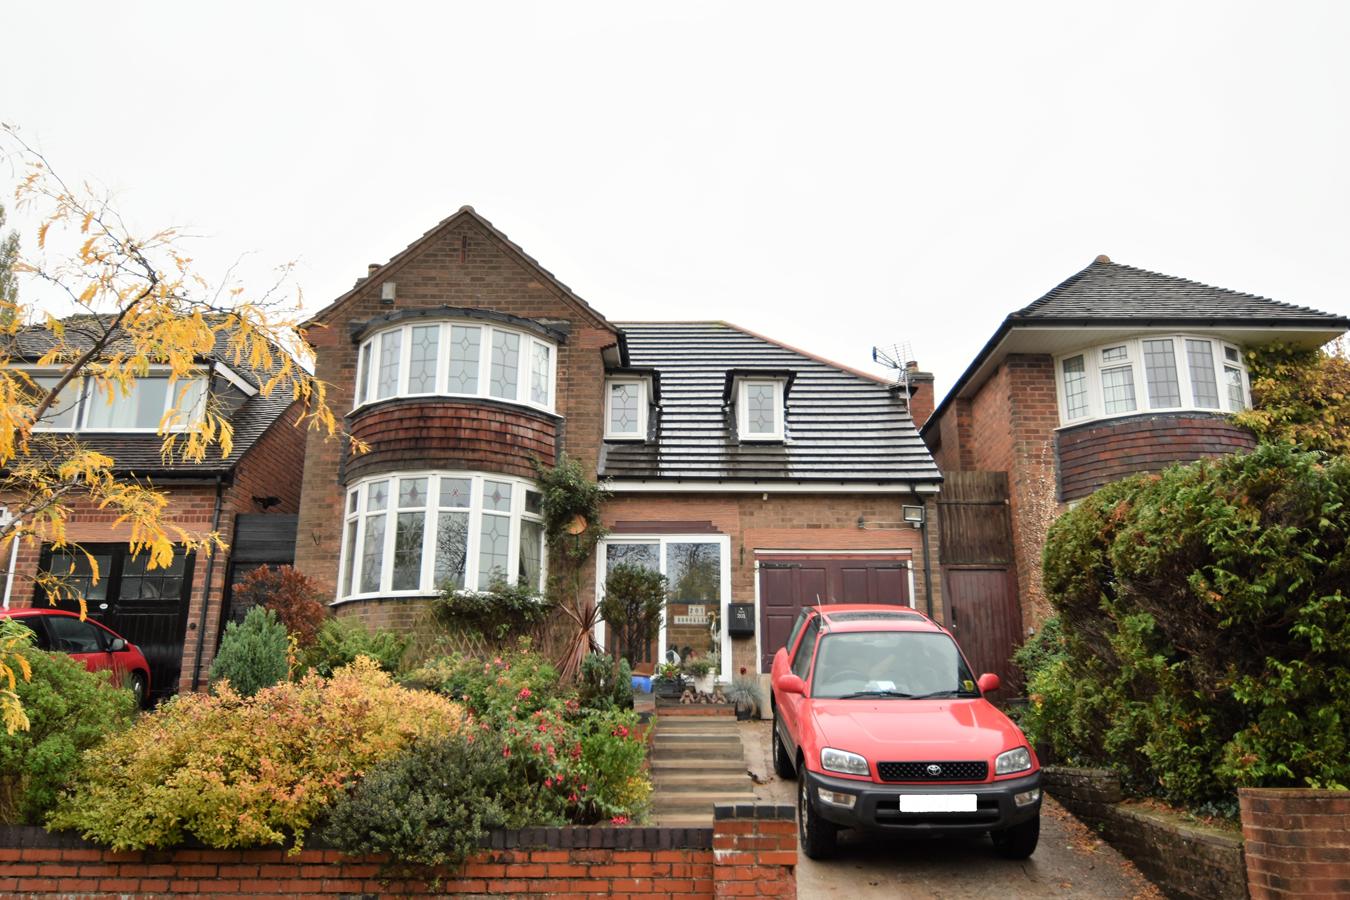 4 Bedroom Property For Sale In Rednal Road Kings Norton Birmingham B38 Offers In The Region Of 430000